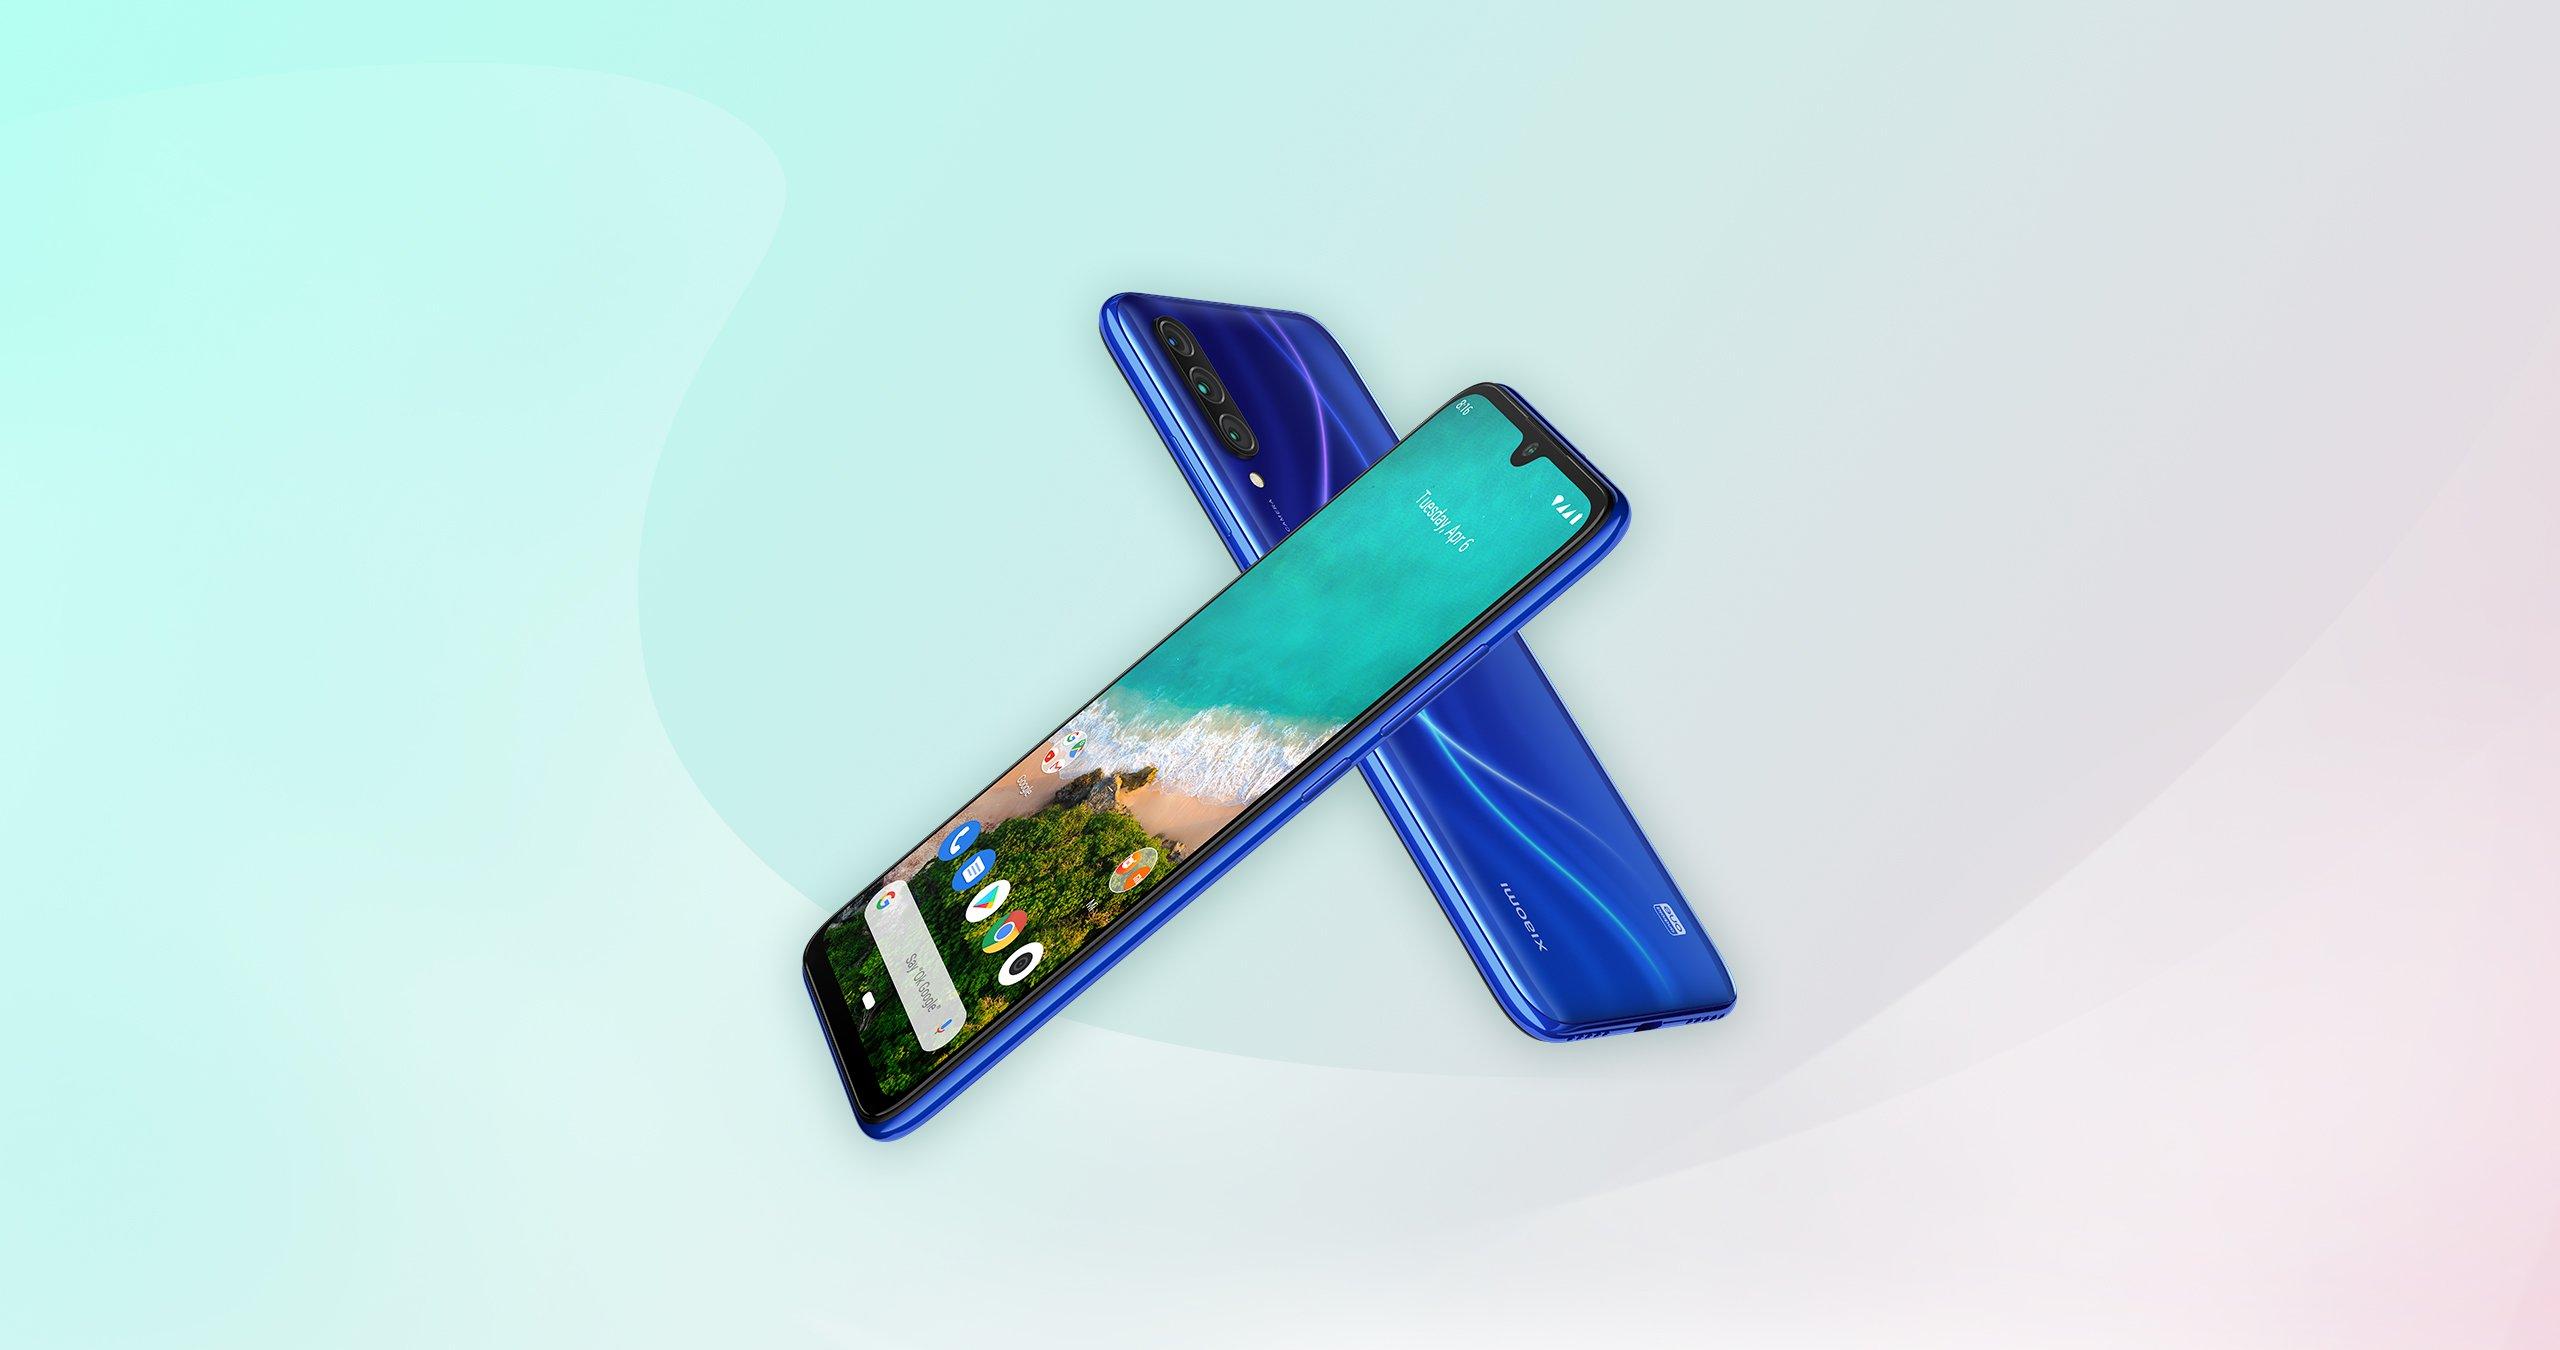 Smartphone Mi A3 - 4+64GB - Albastră